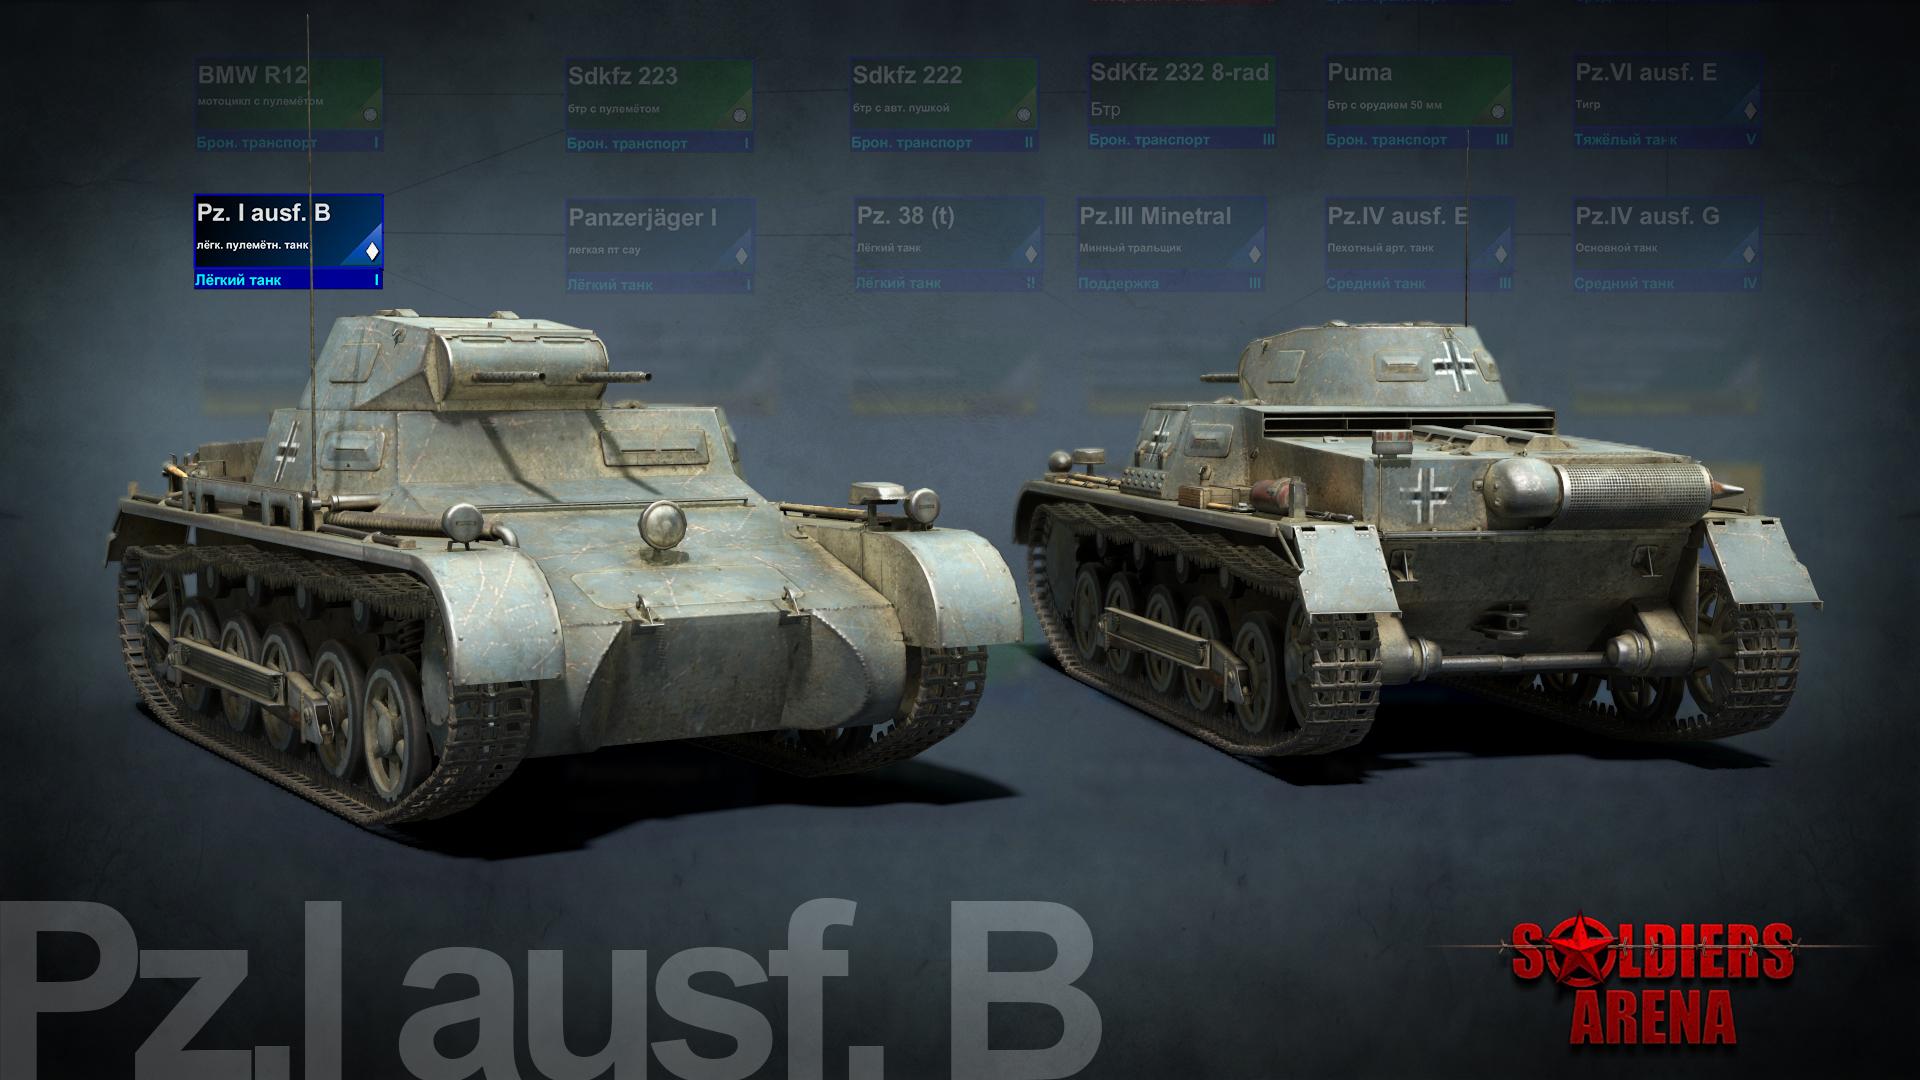 Panzerkampfwagen I Ausf.B - Soldiers: Arena Арт